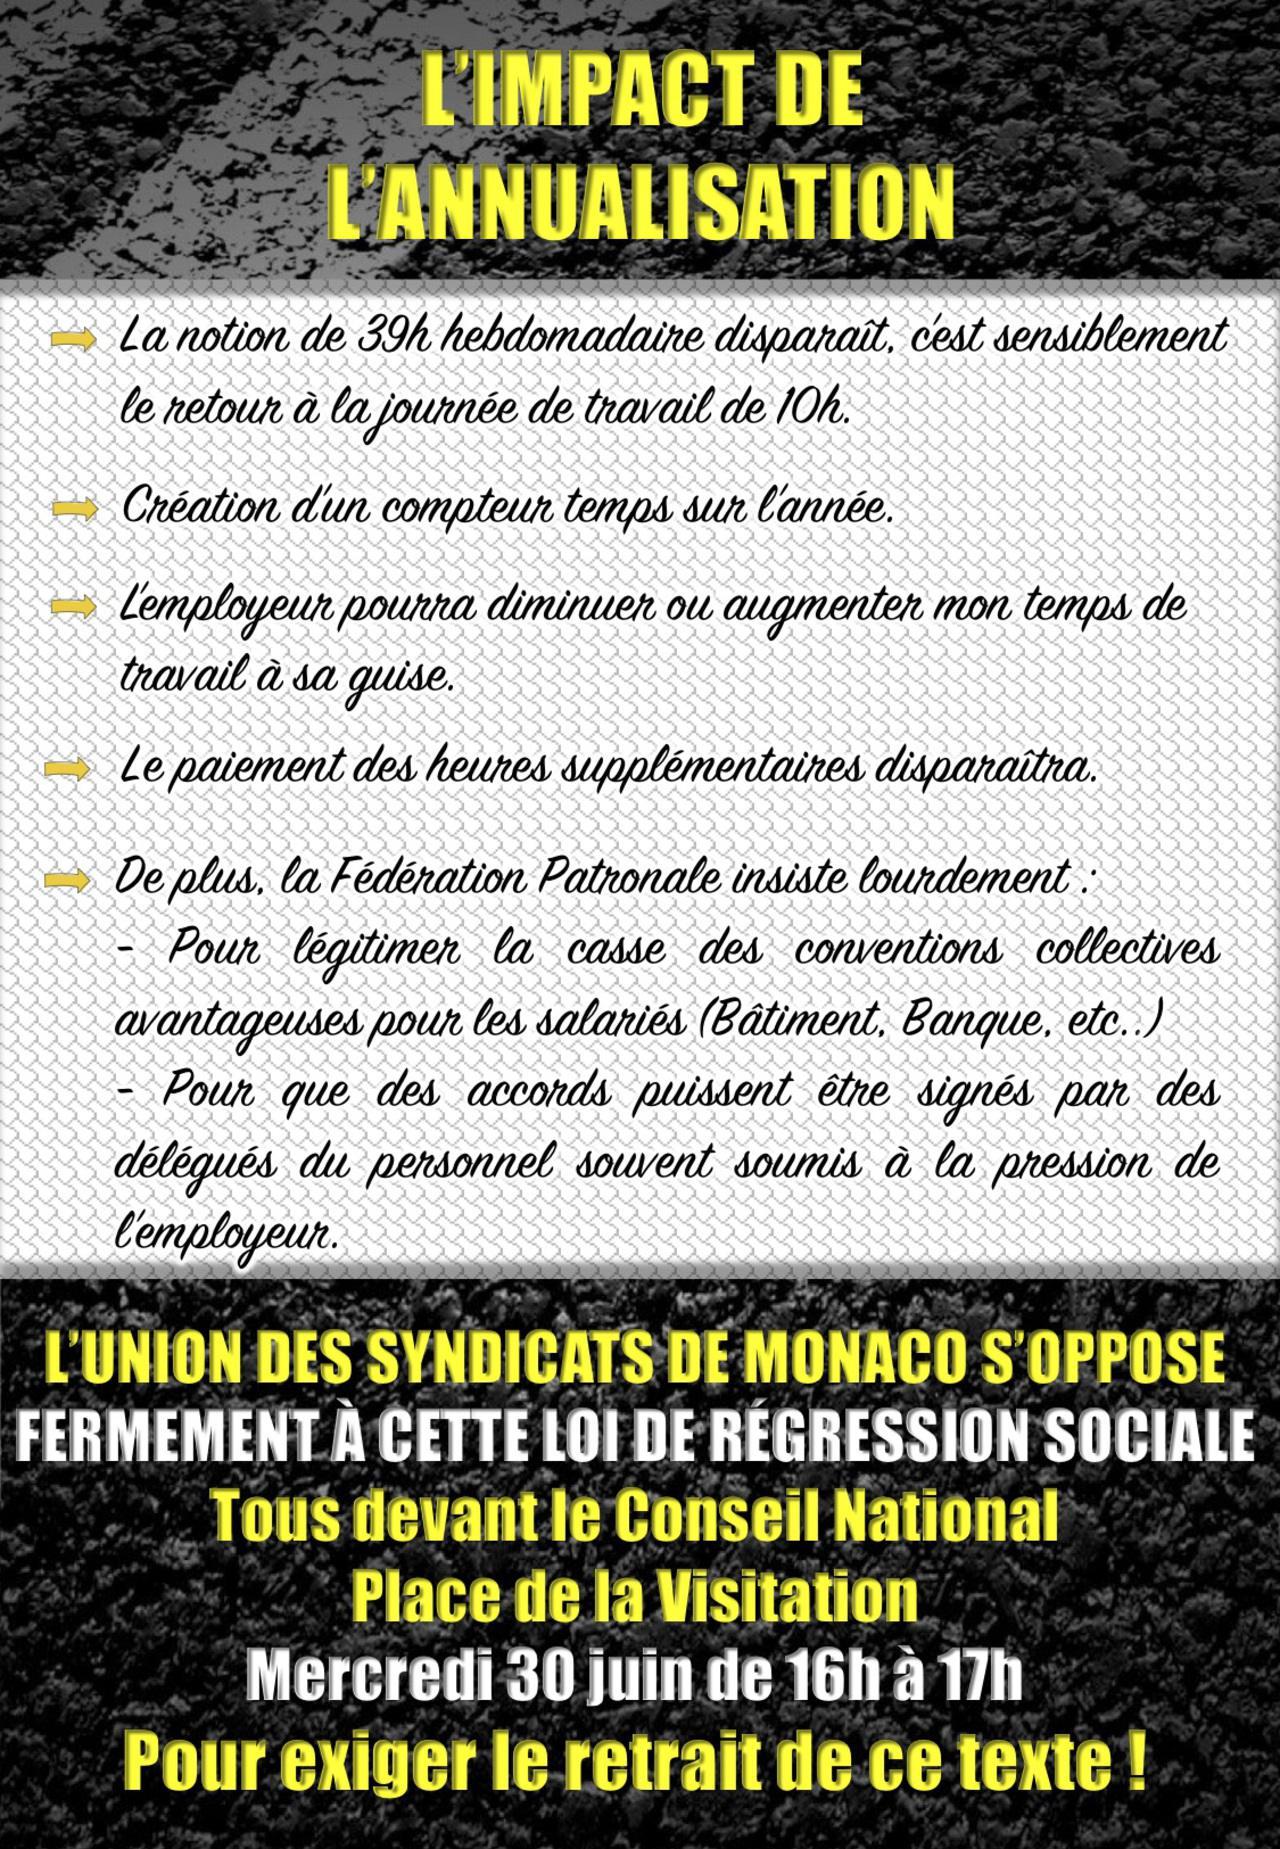 Loi Annualisation Verso